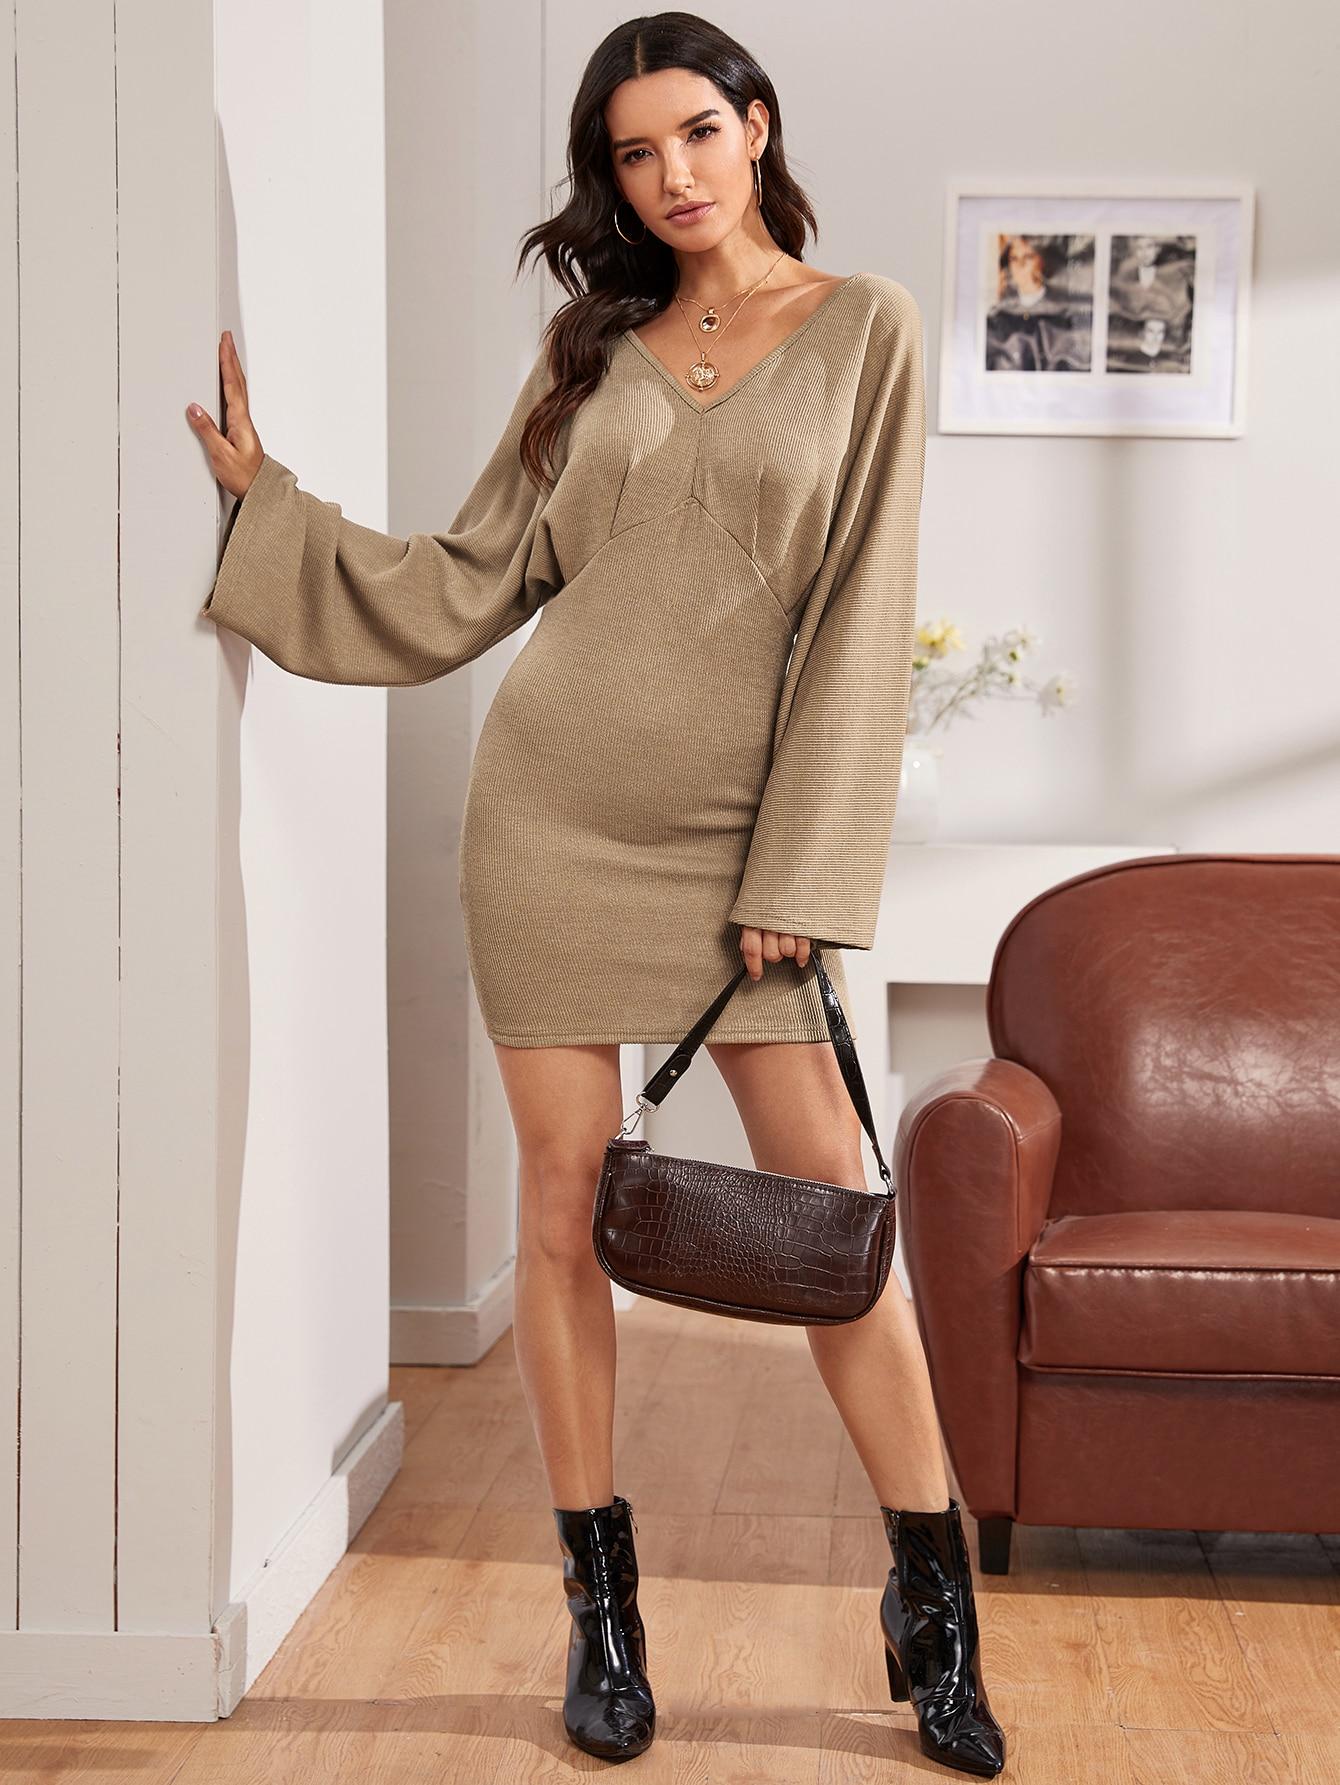 SHEIN / Tie Back Batwing Sleeve Bodycon Dress